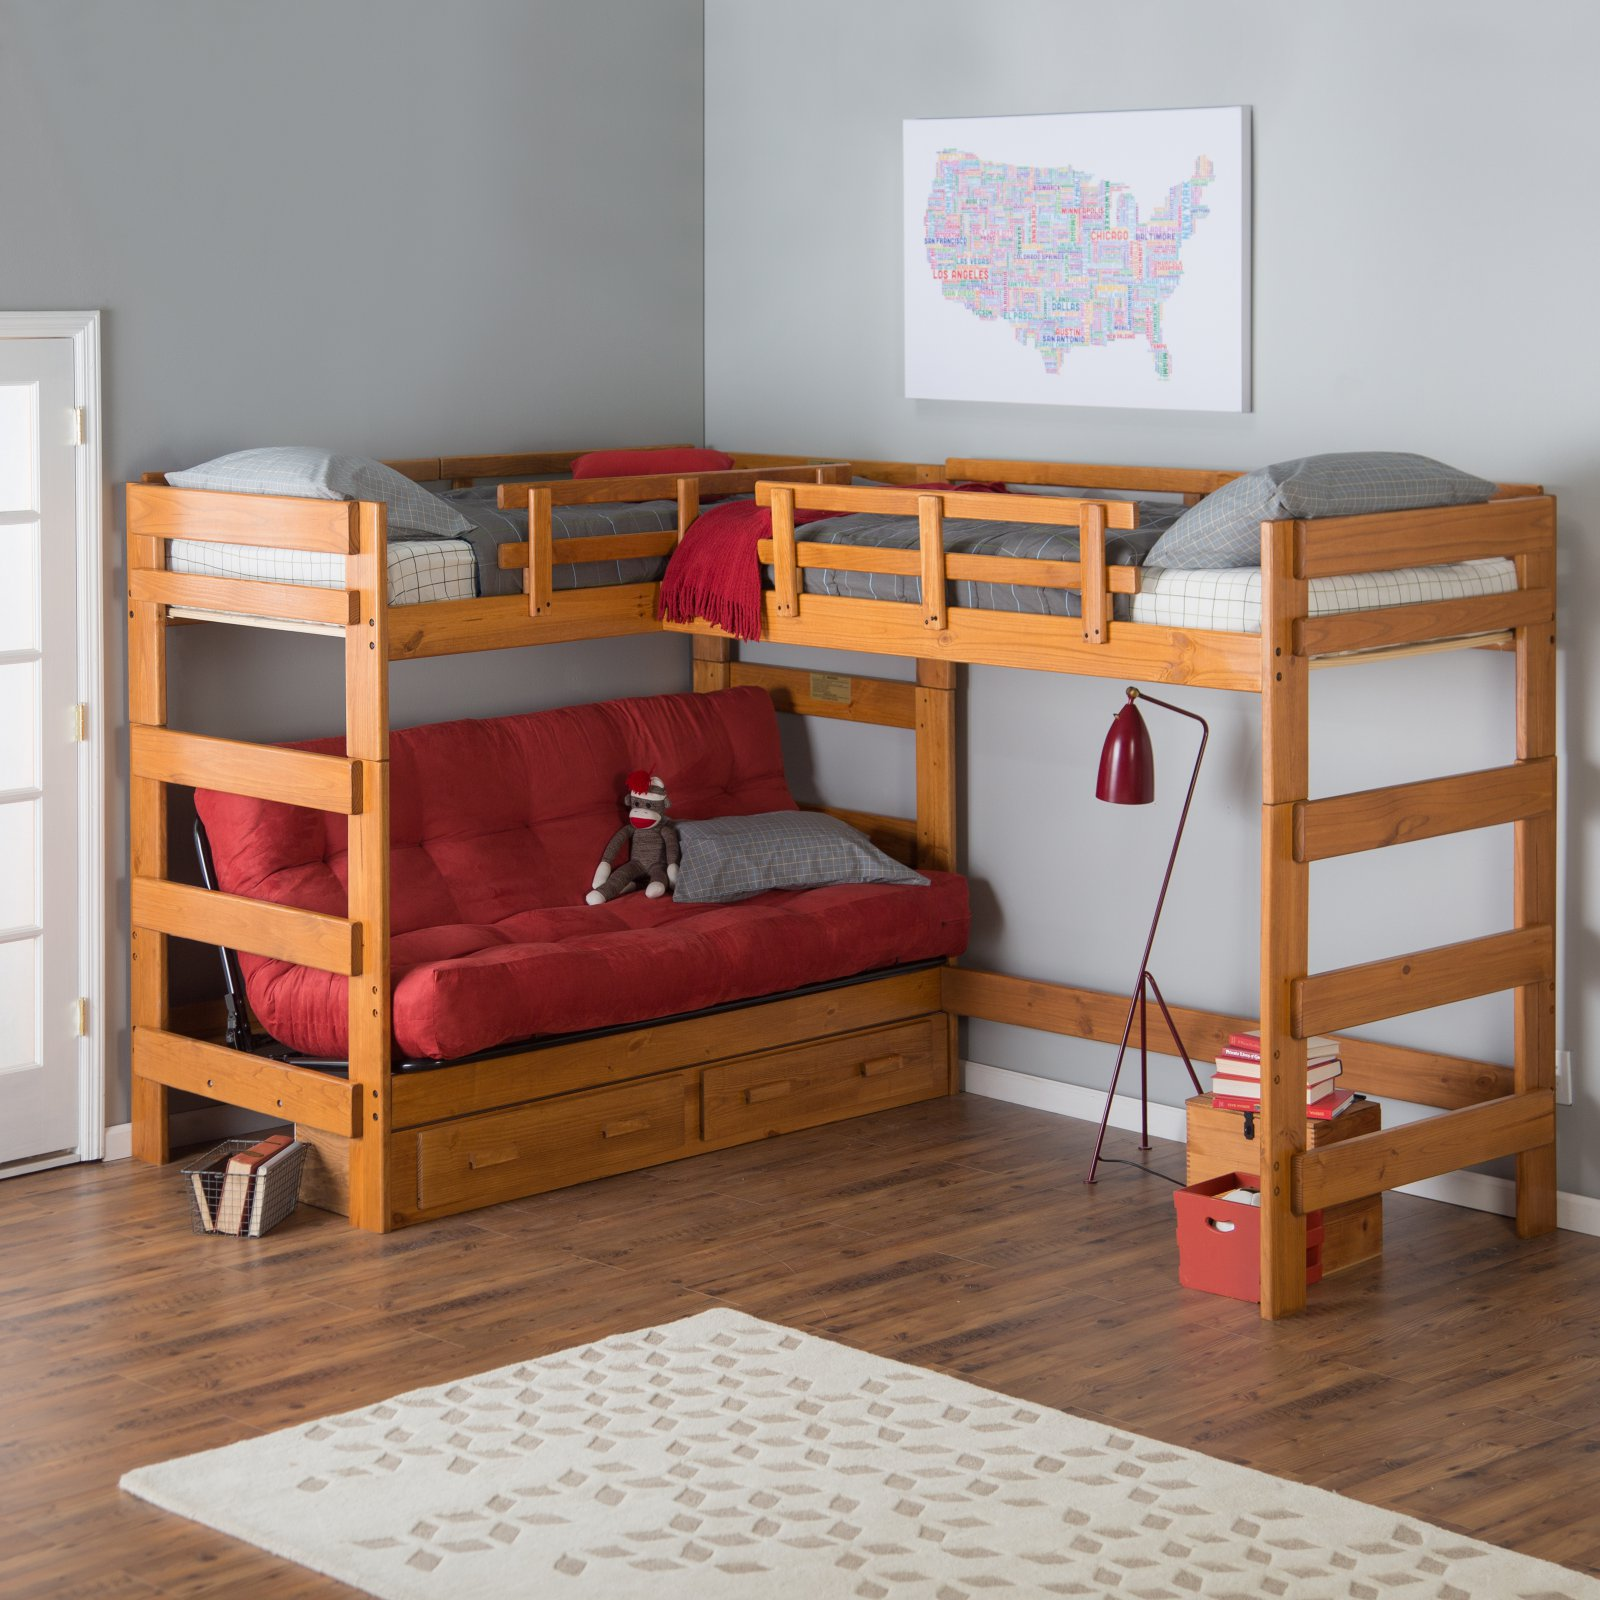 Woodcrest Heartland Futon Bunk Bed with Extra Loft - Honey Pine ...